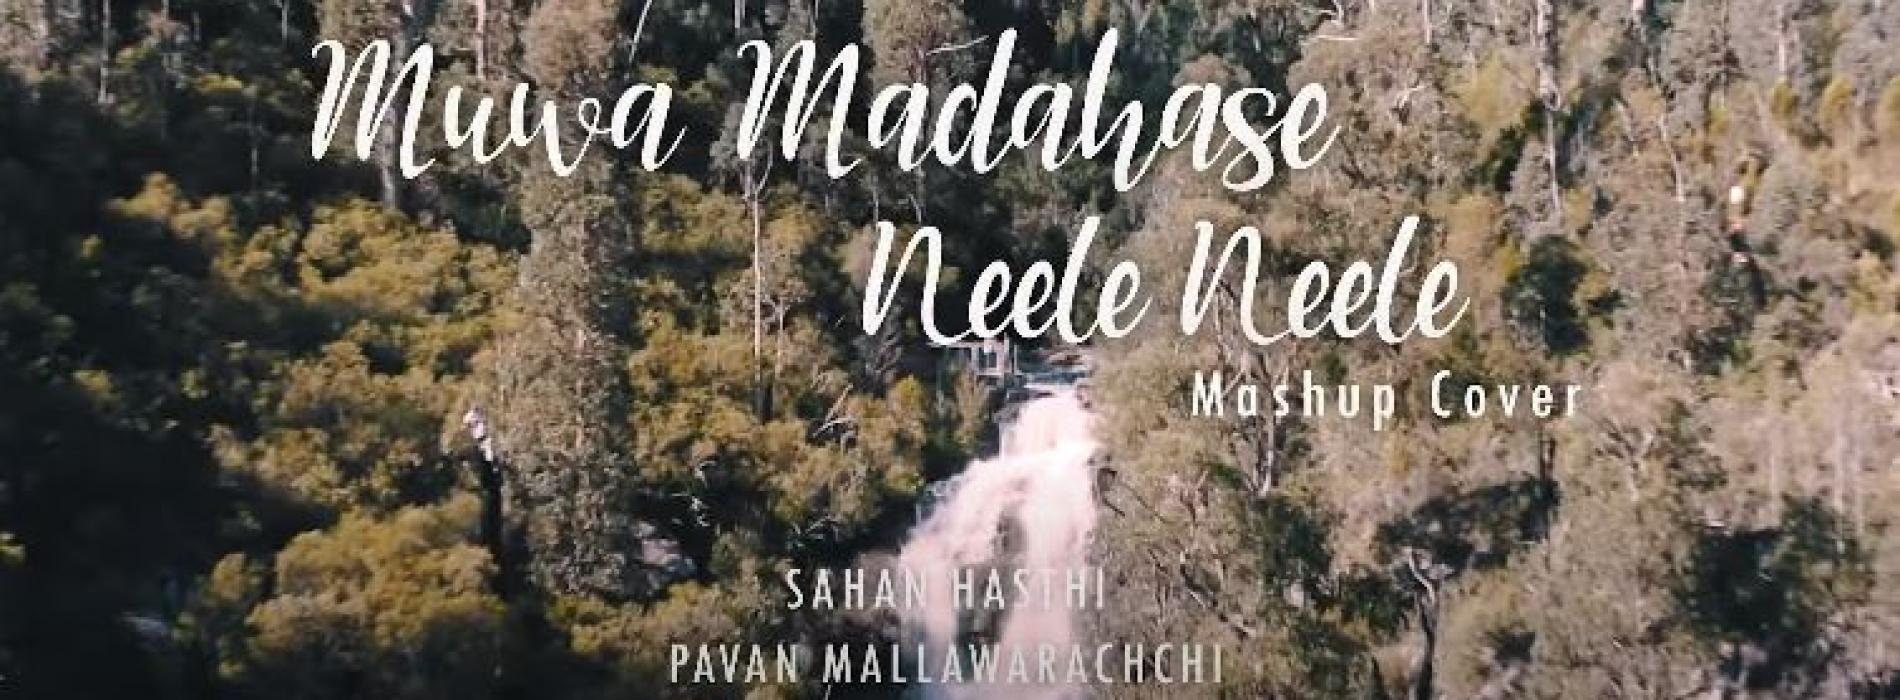 Muwa Madahase / Neele Neele (Mashup) – Sahan Hasthi & Pavan Mallawarachchi [Official Video]